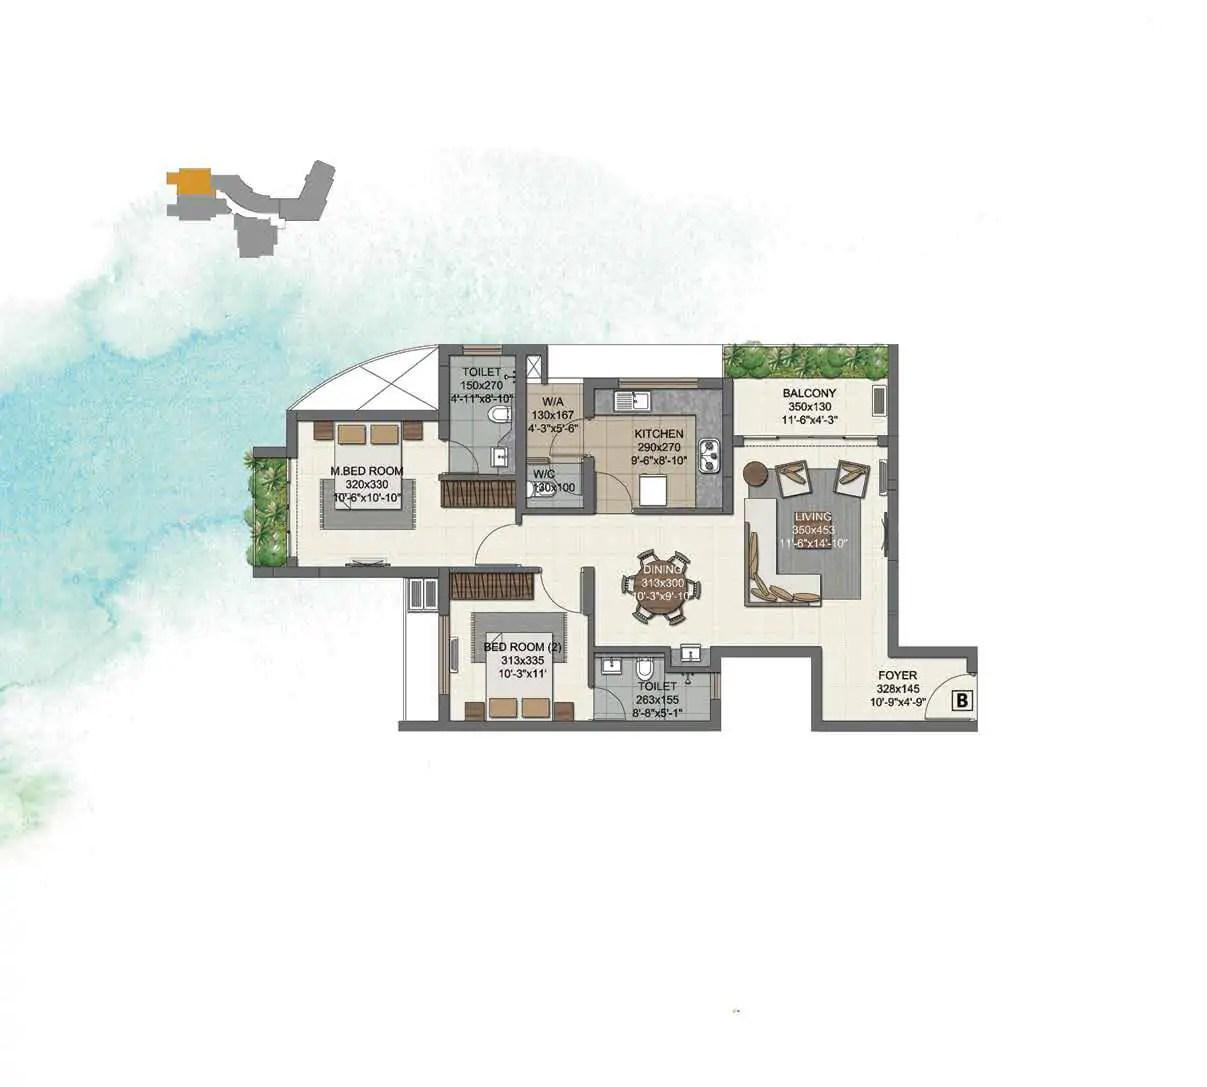 UNIT B (2 BHK) 1ST - 4TH FLOORS